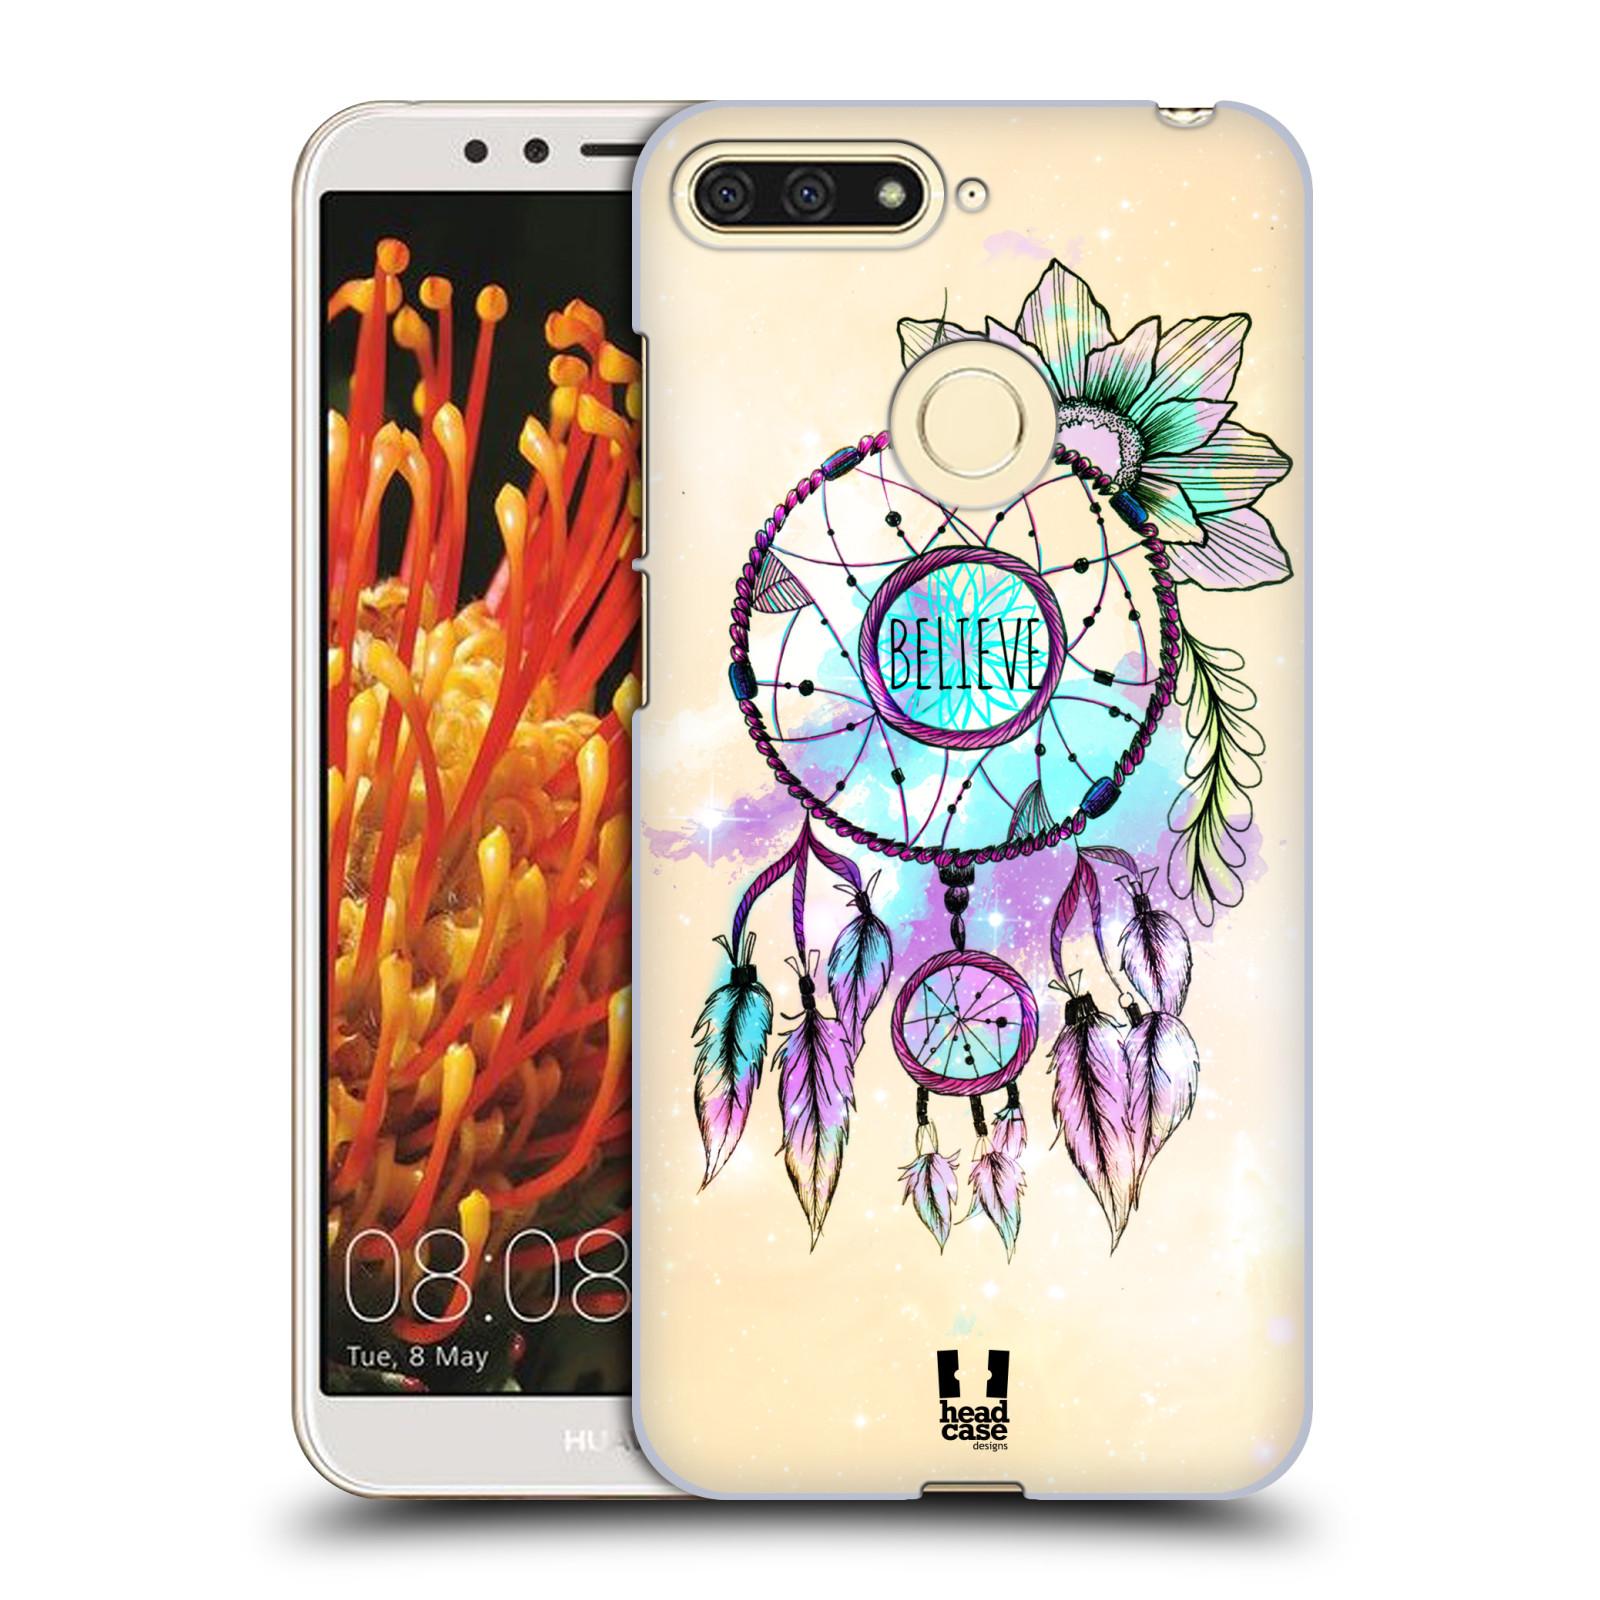 Plastové pouzdro na mobil Huawei Y6 Prime 2018 - Head Case - MIX BELIEVE